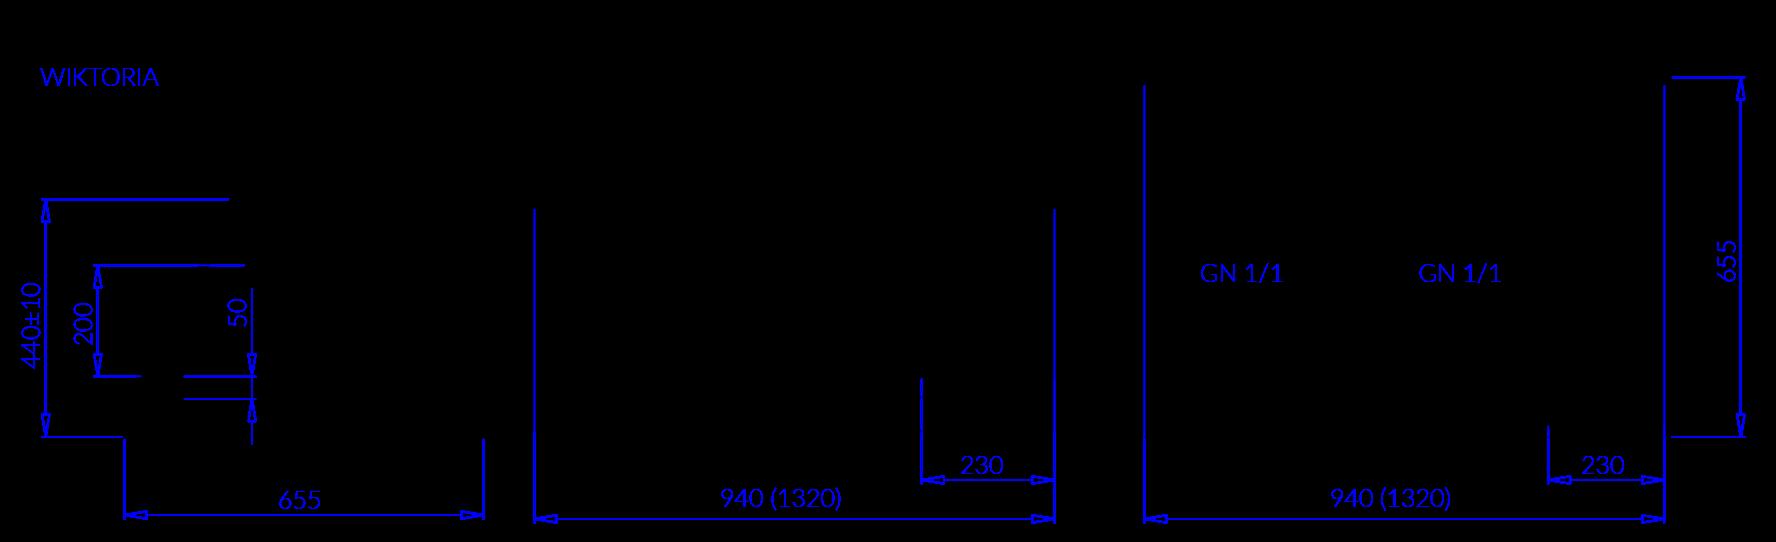 Технический чертеж WIKTORIA